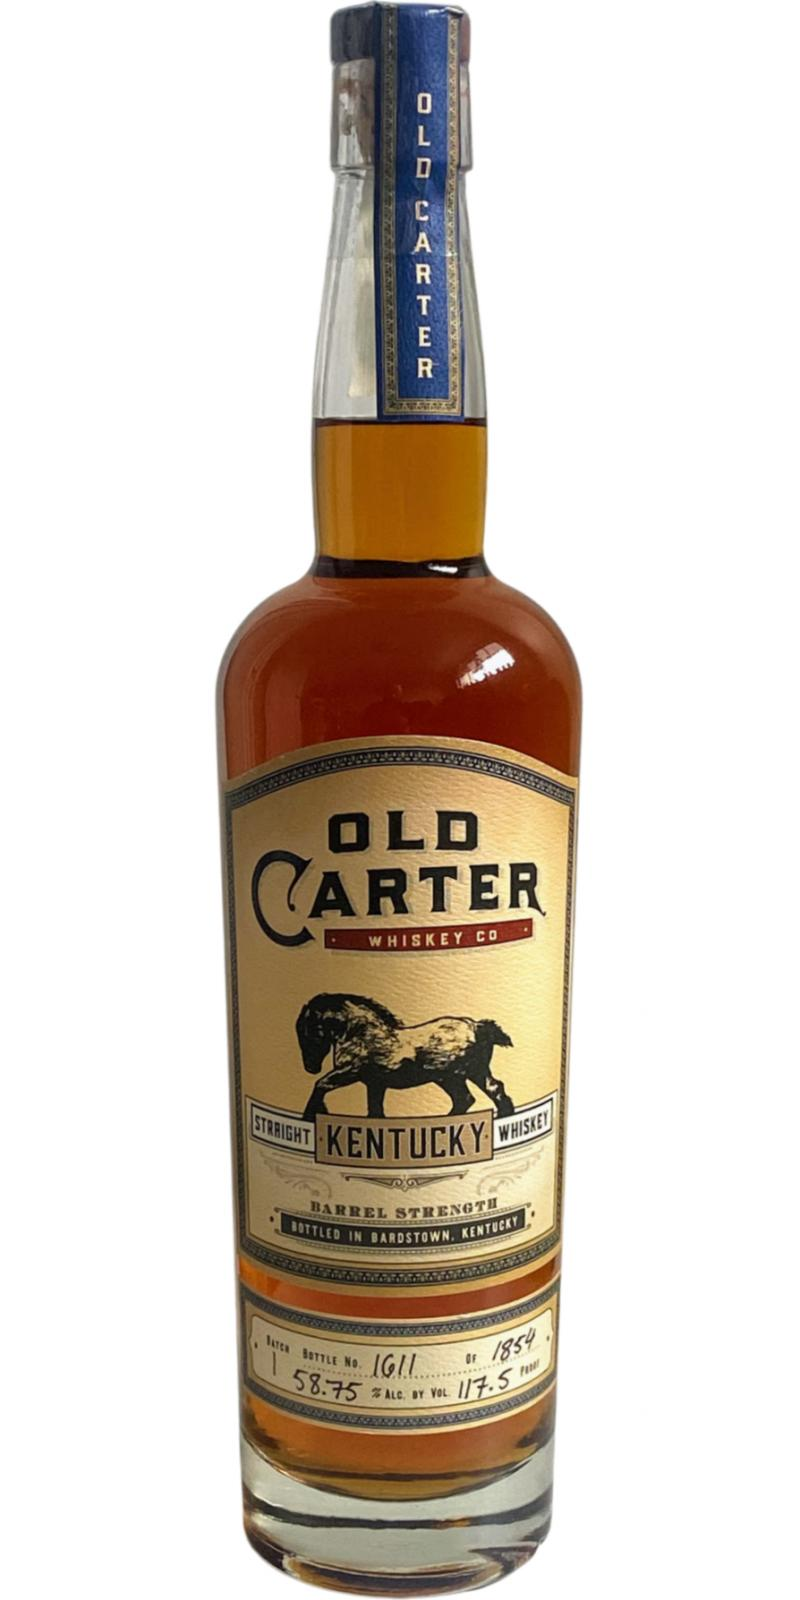 Old Carter Straight Kentucky Whiskey